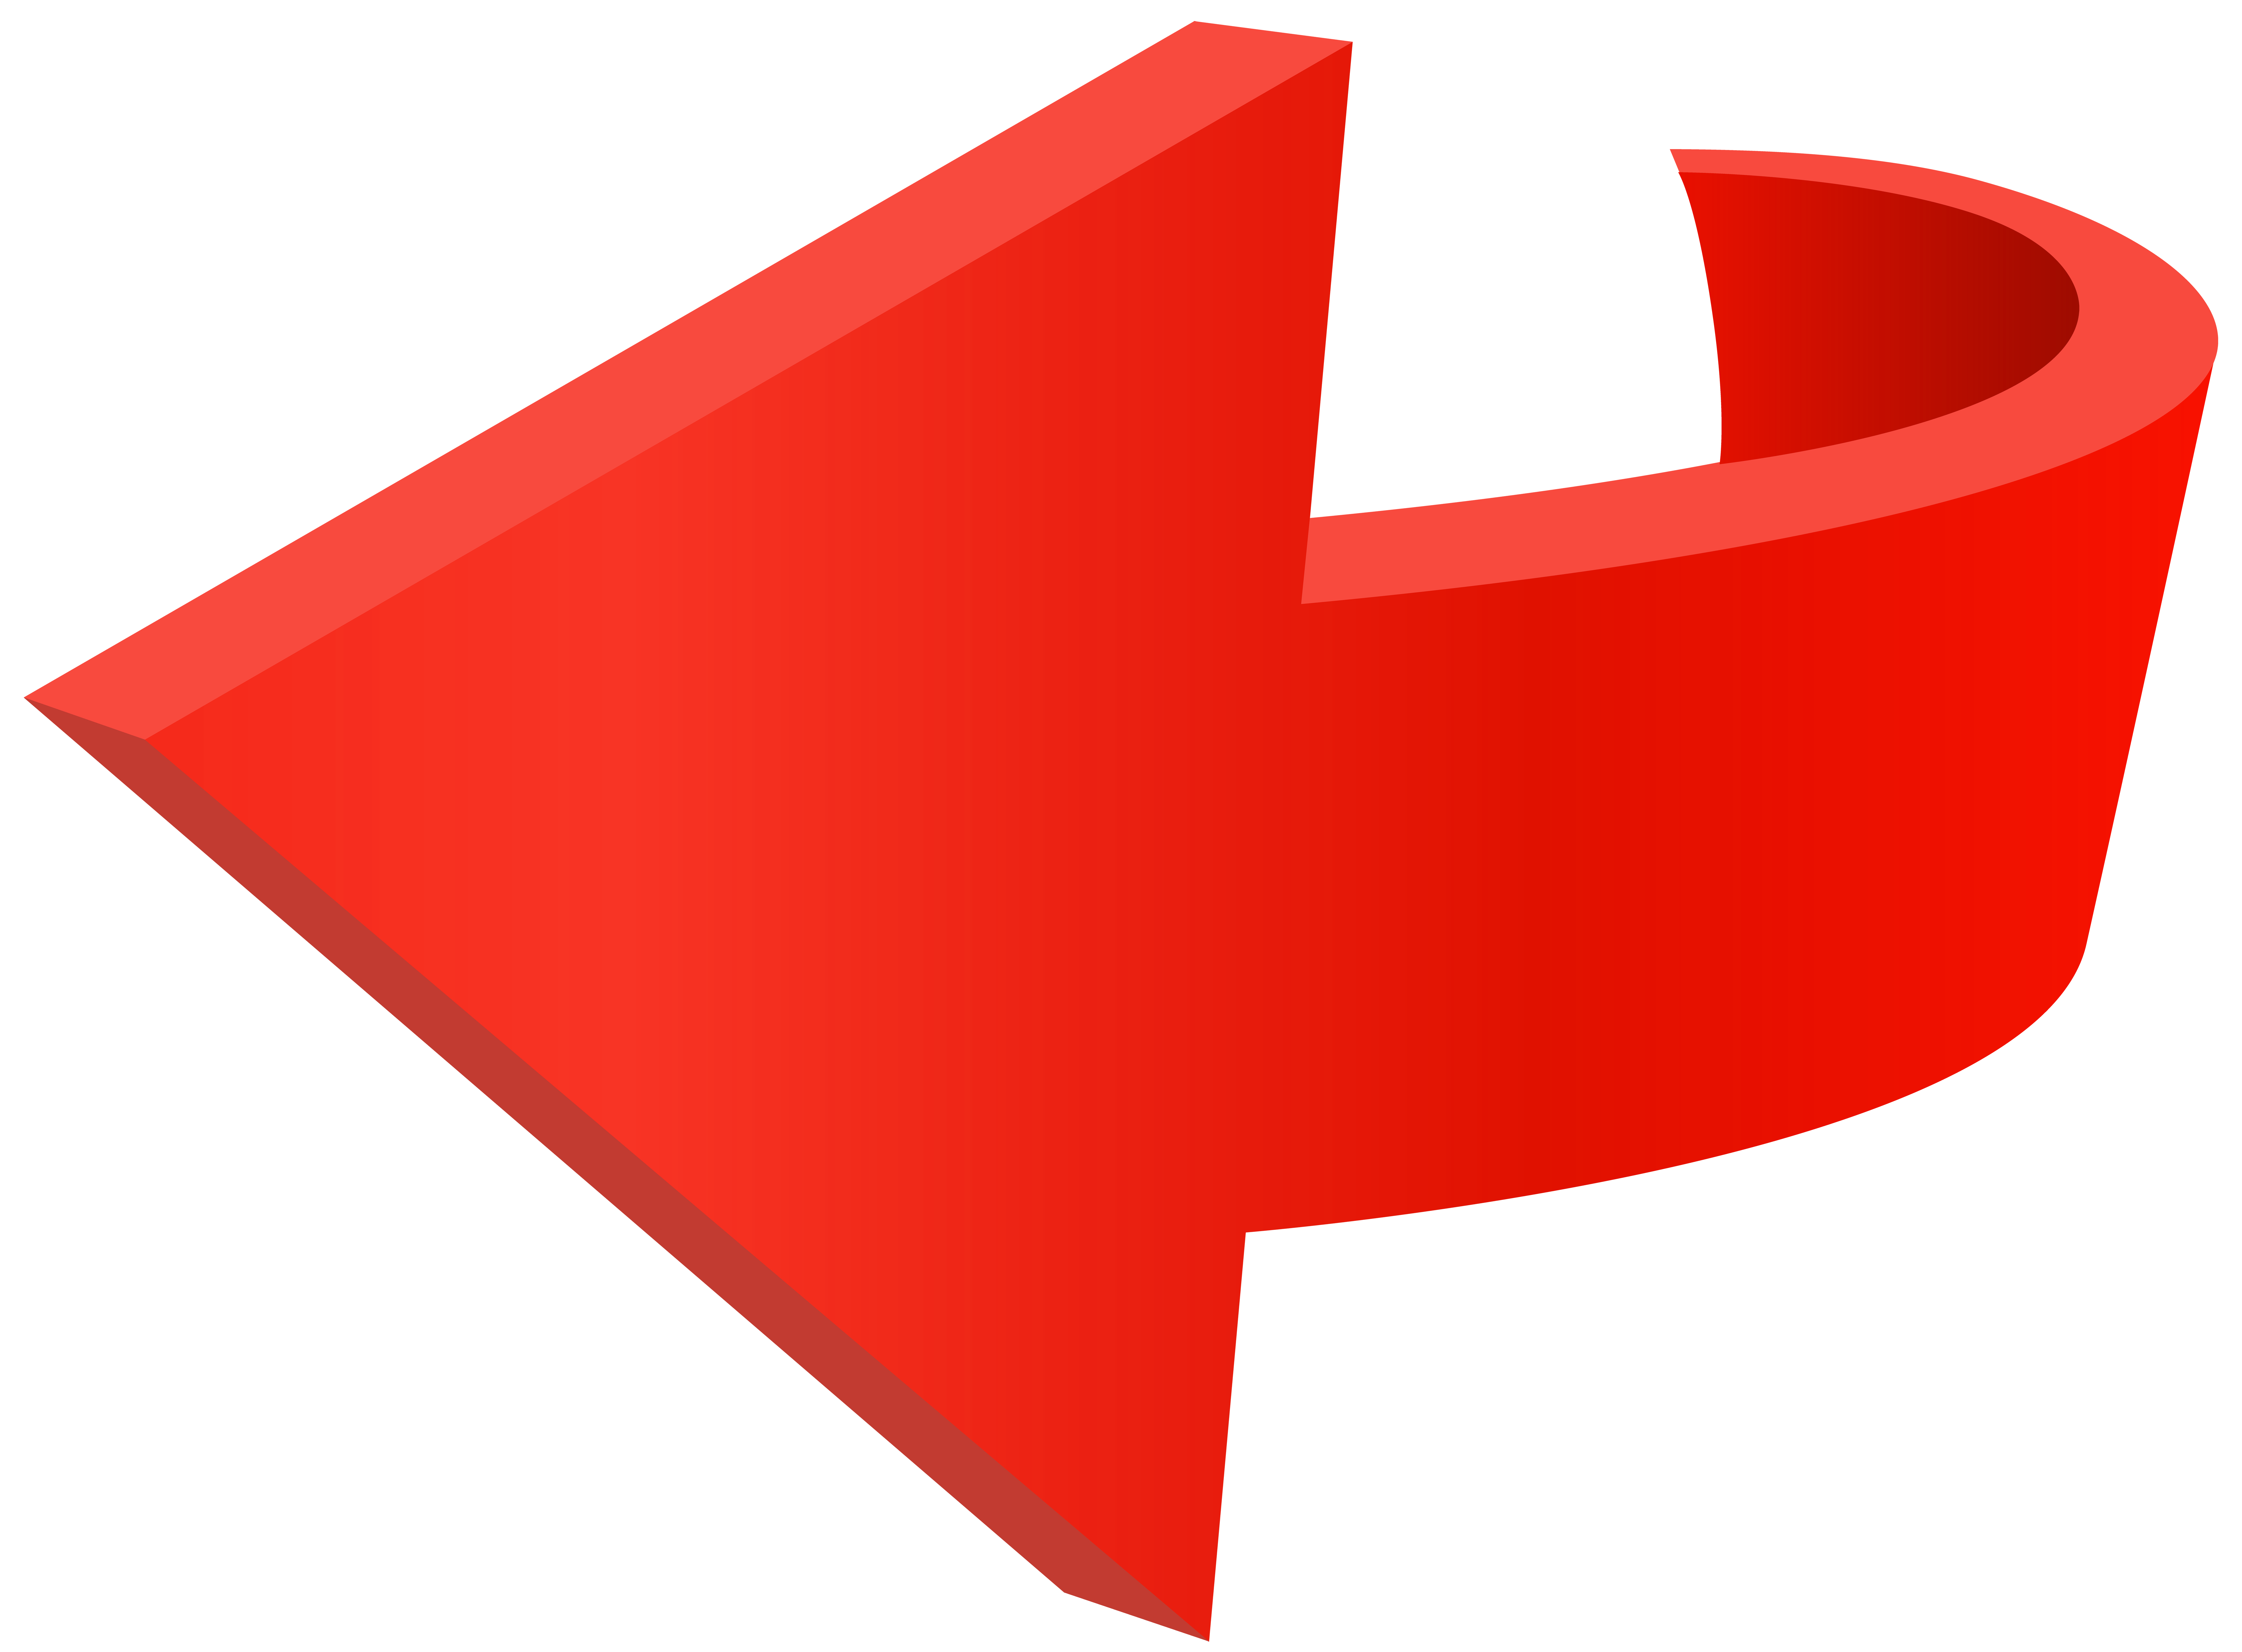 Artistic arrow clipart svg transparent download Left Red Arrow Transparent PNG Clip Art Image | flèche | Pinterest ... svg transparent download